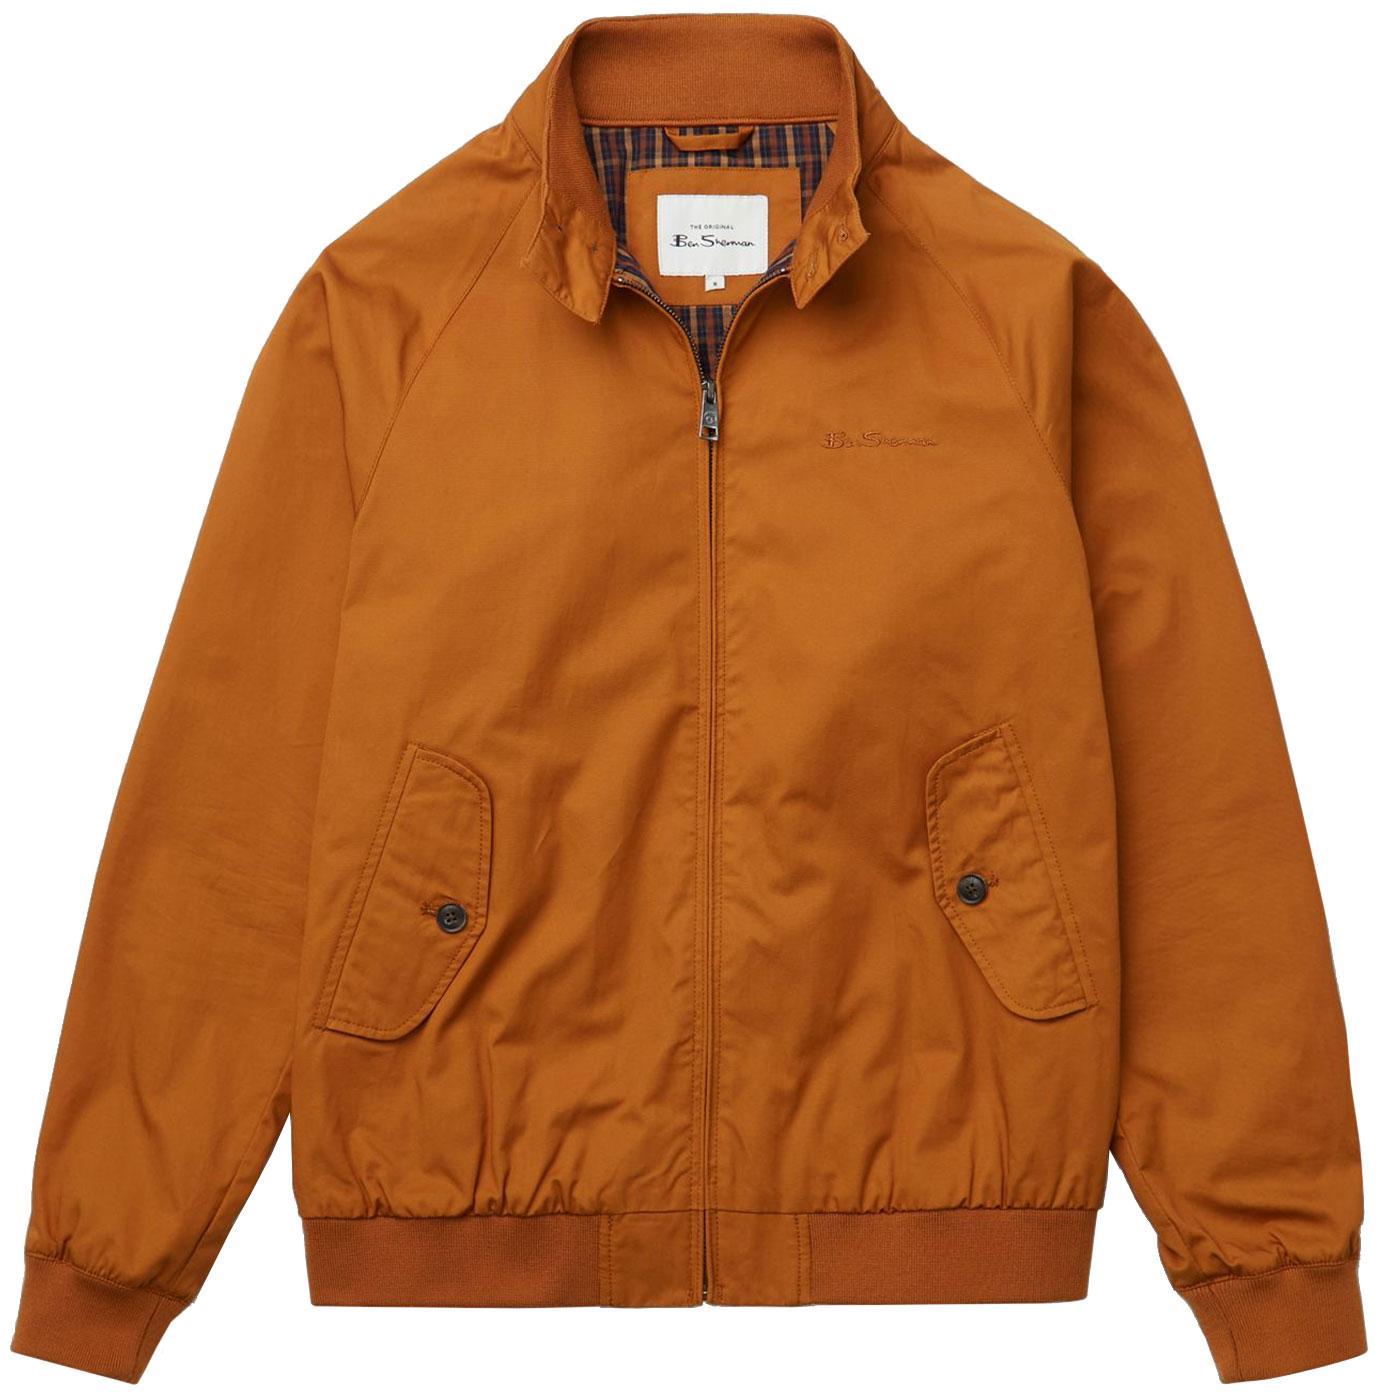 BEN SHERMAN Signature Harrington Jacket GOLD METAL